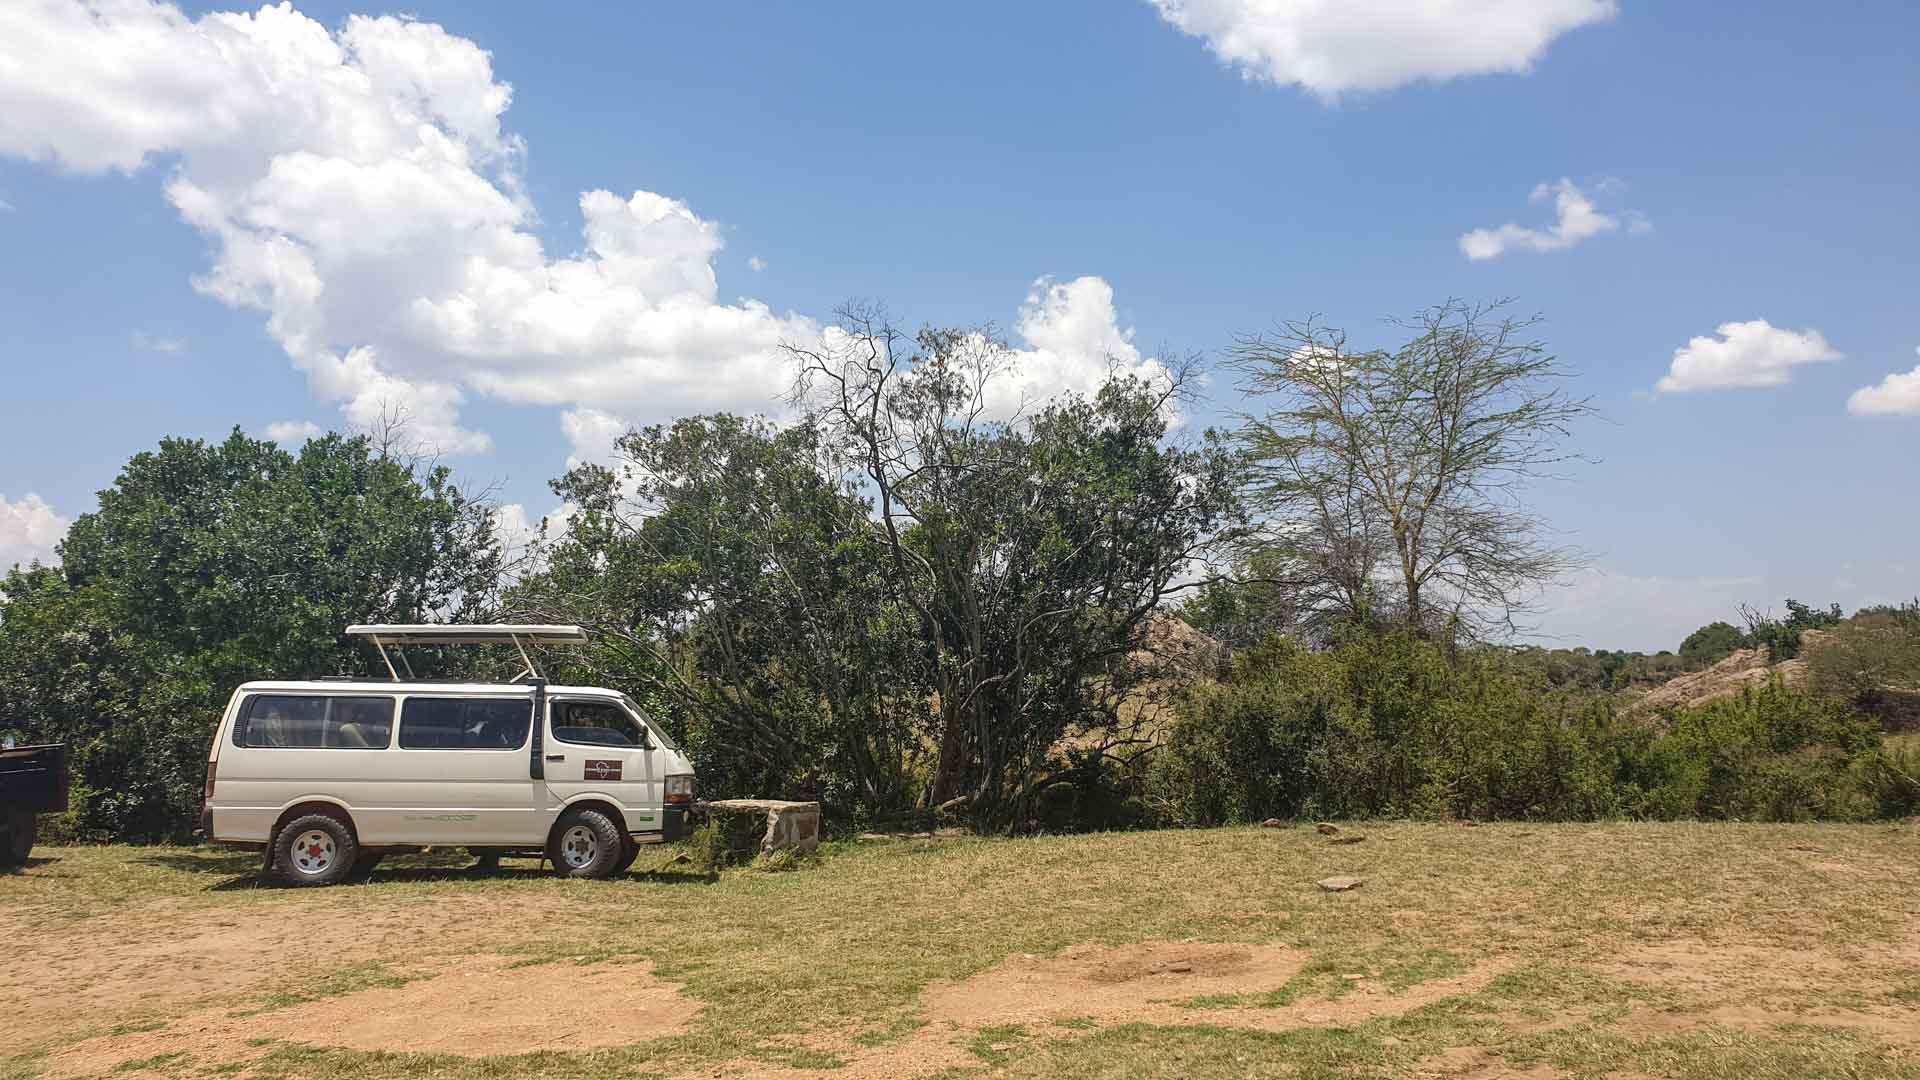 Nuestra minivan en Masai Mara, Kenia